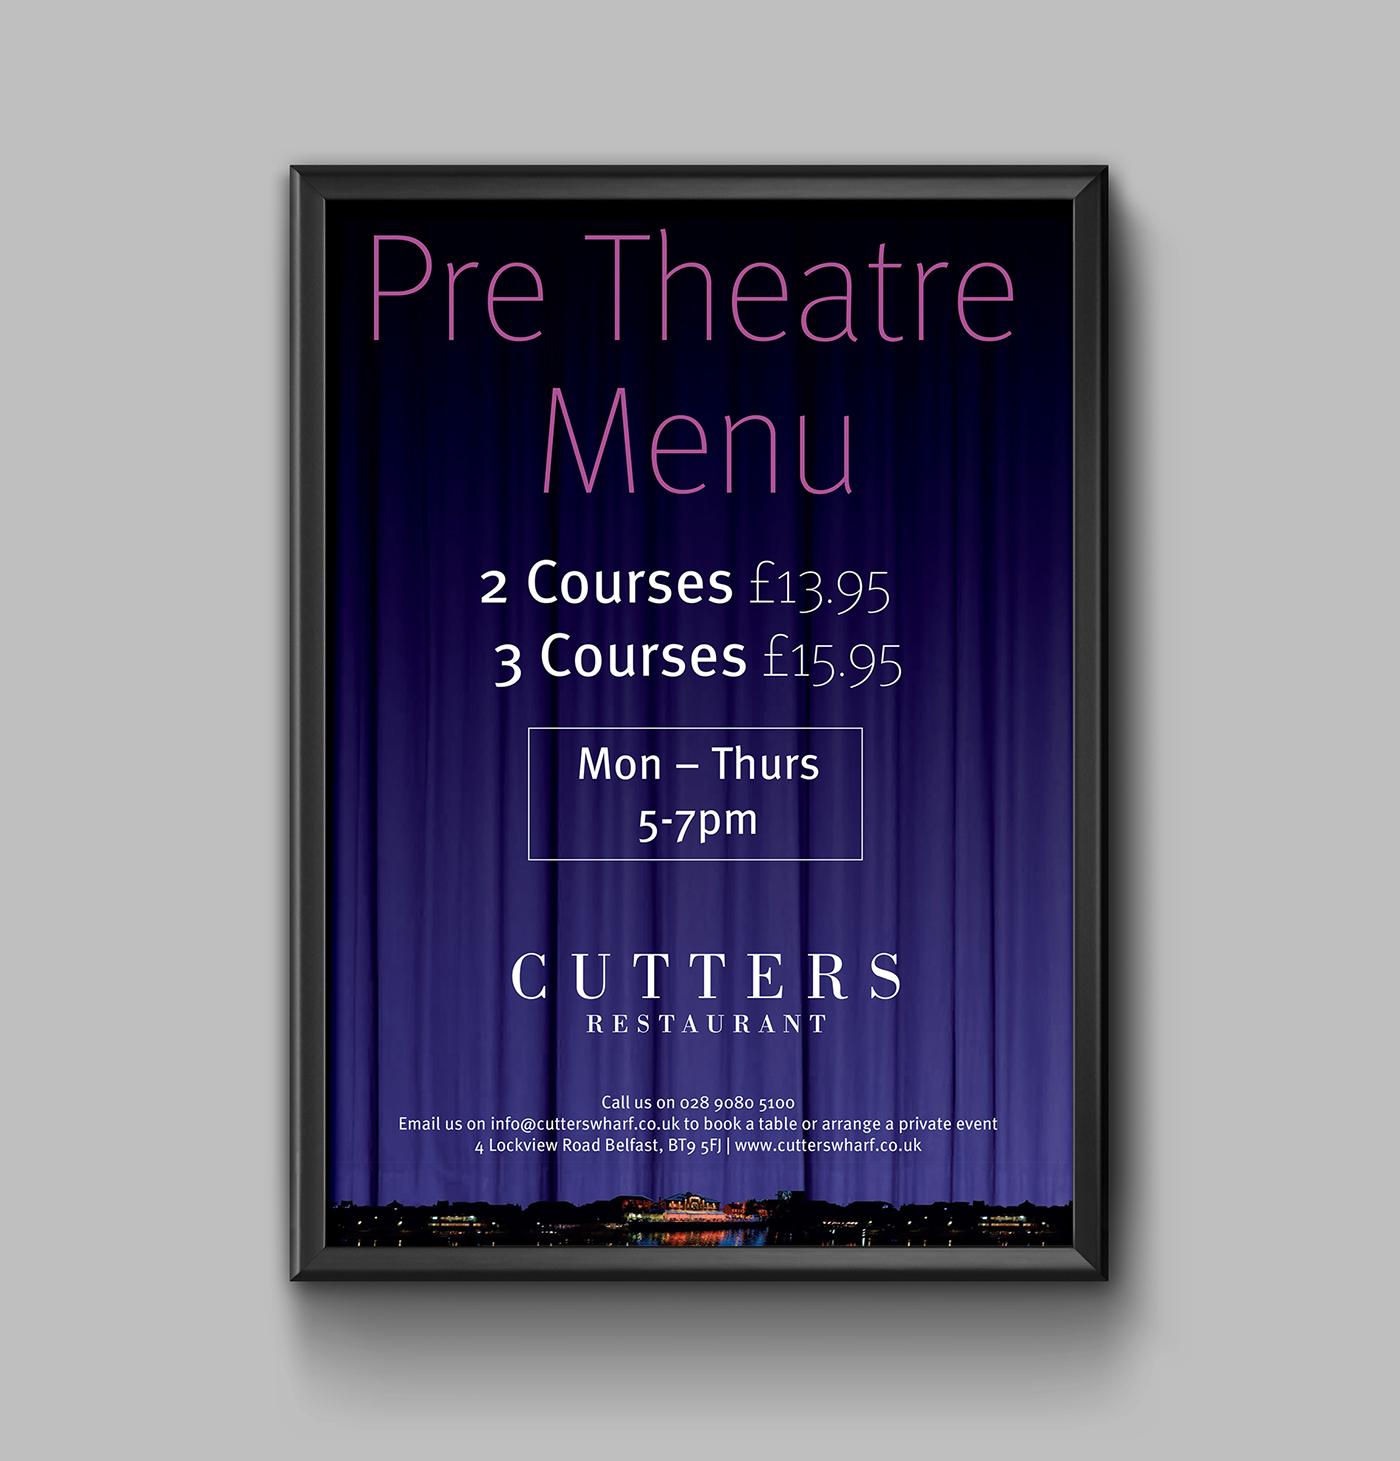 resturant poster menu Food  river blue purple